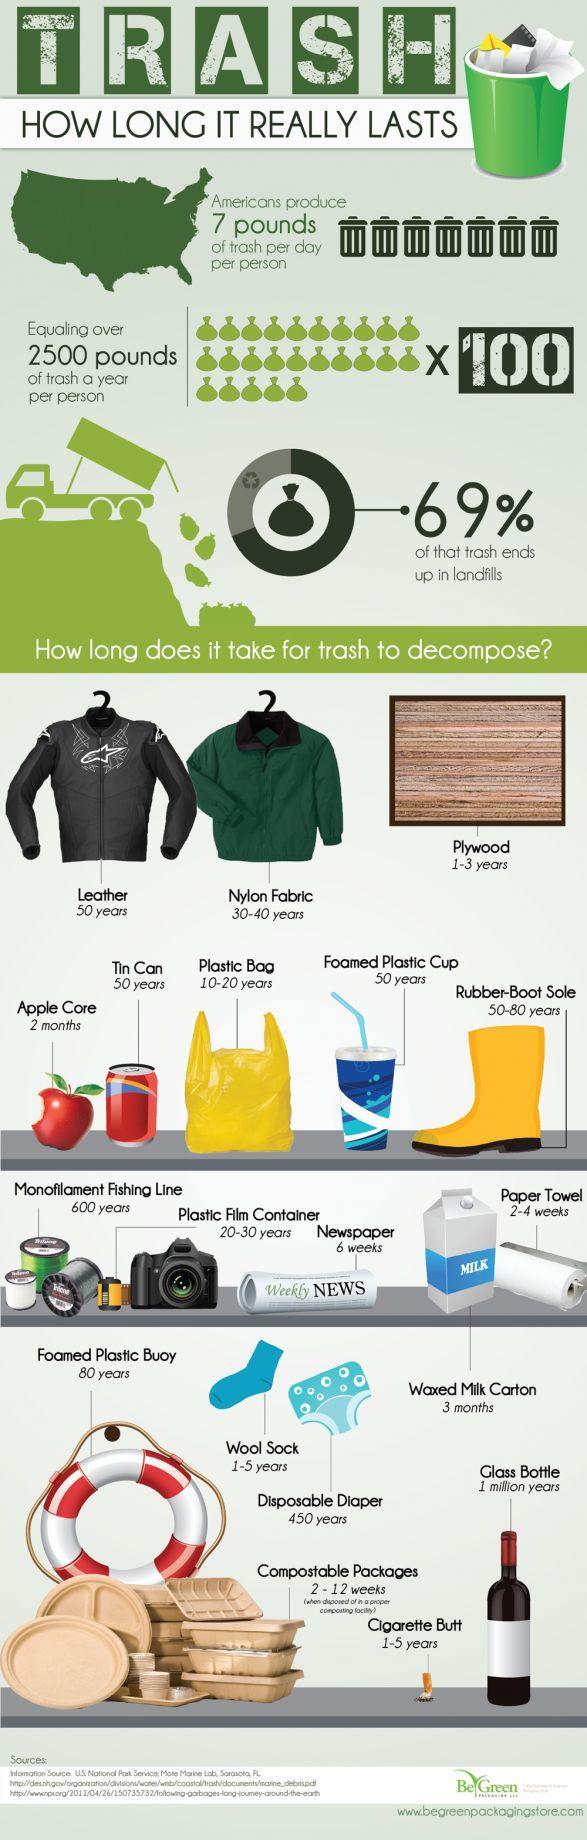 Trash - How Long It Really Lasts   #lifeadvancer   www.lifeadvancer.com.